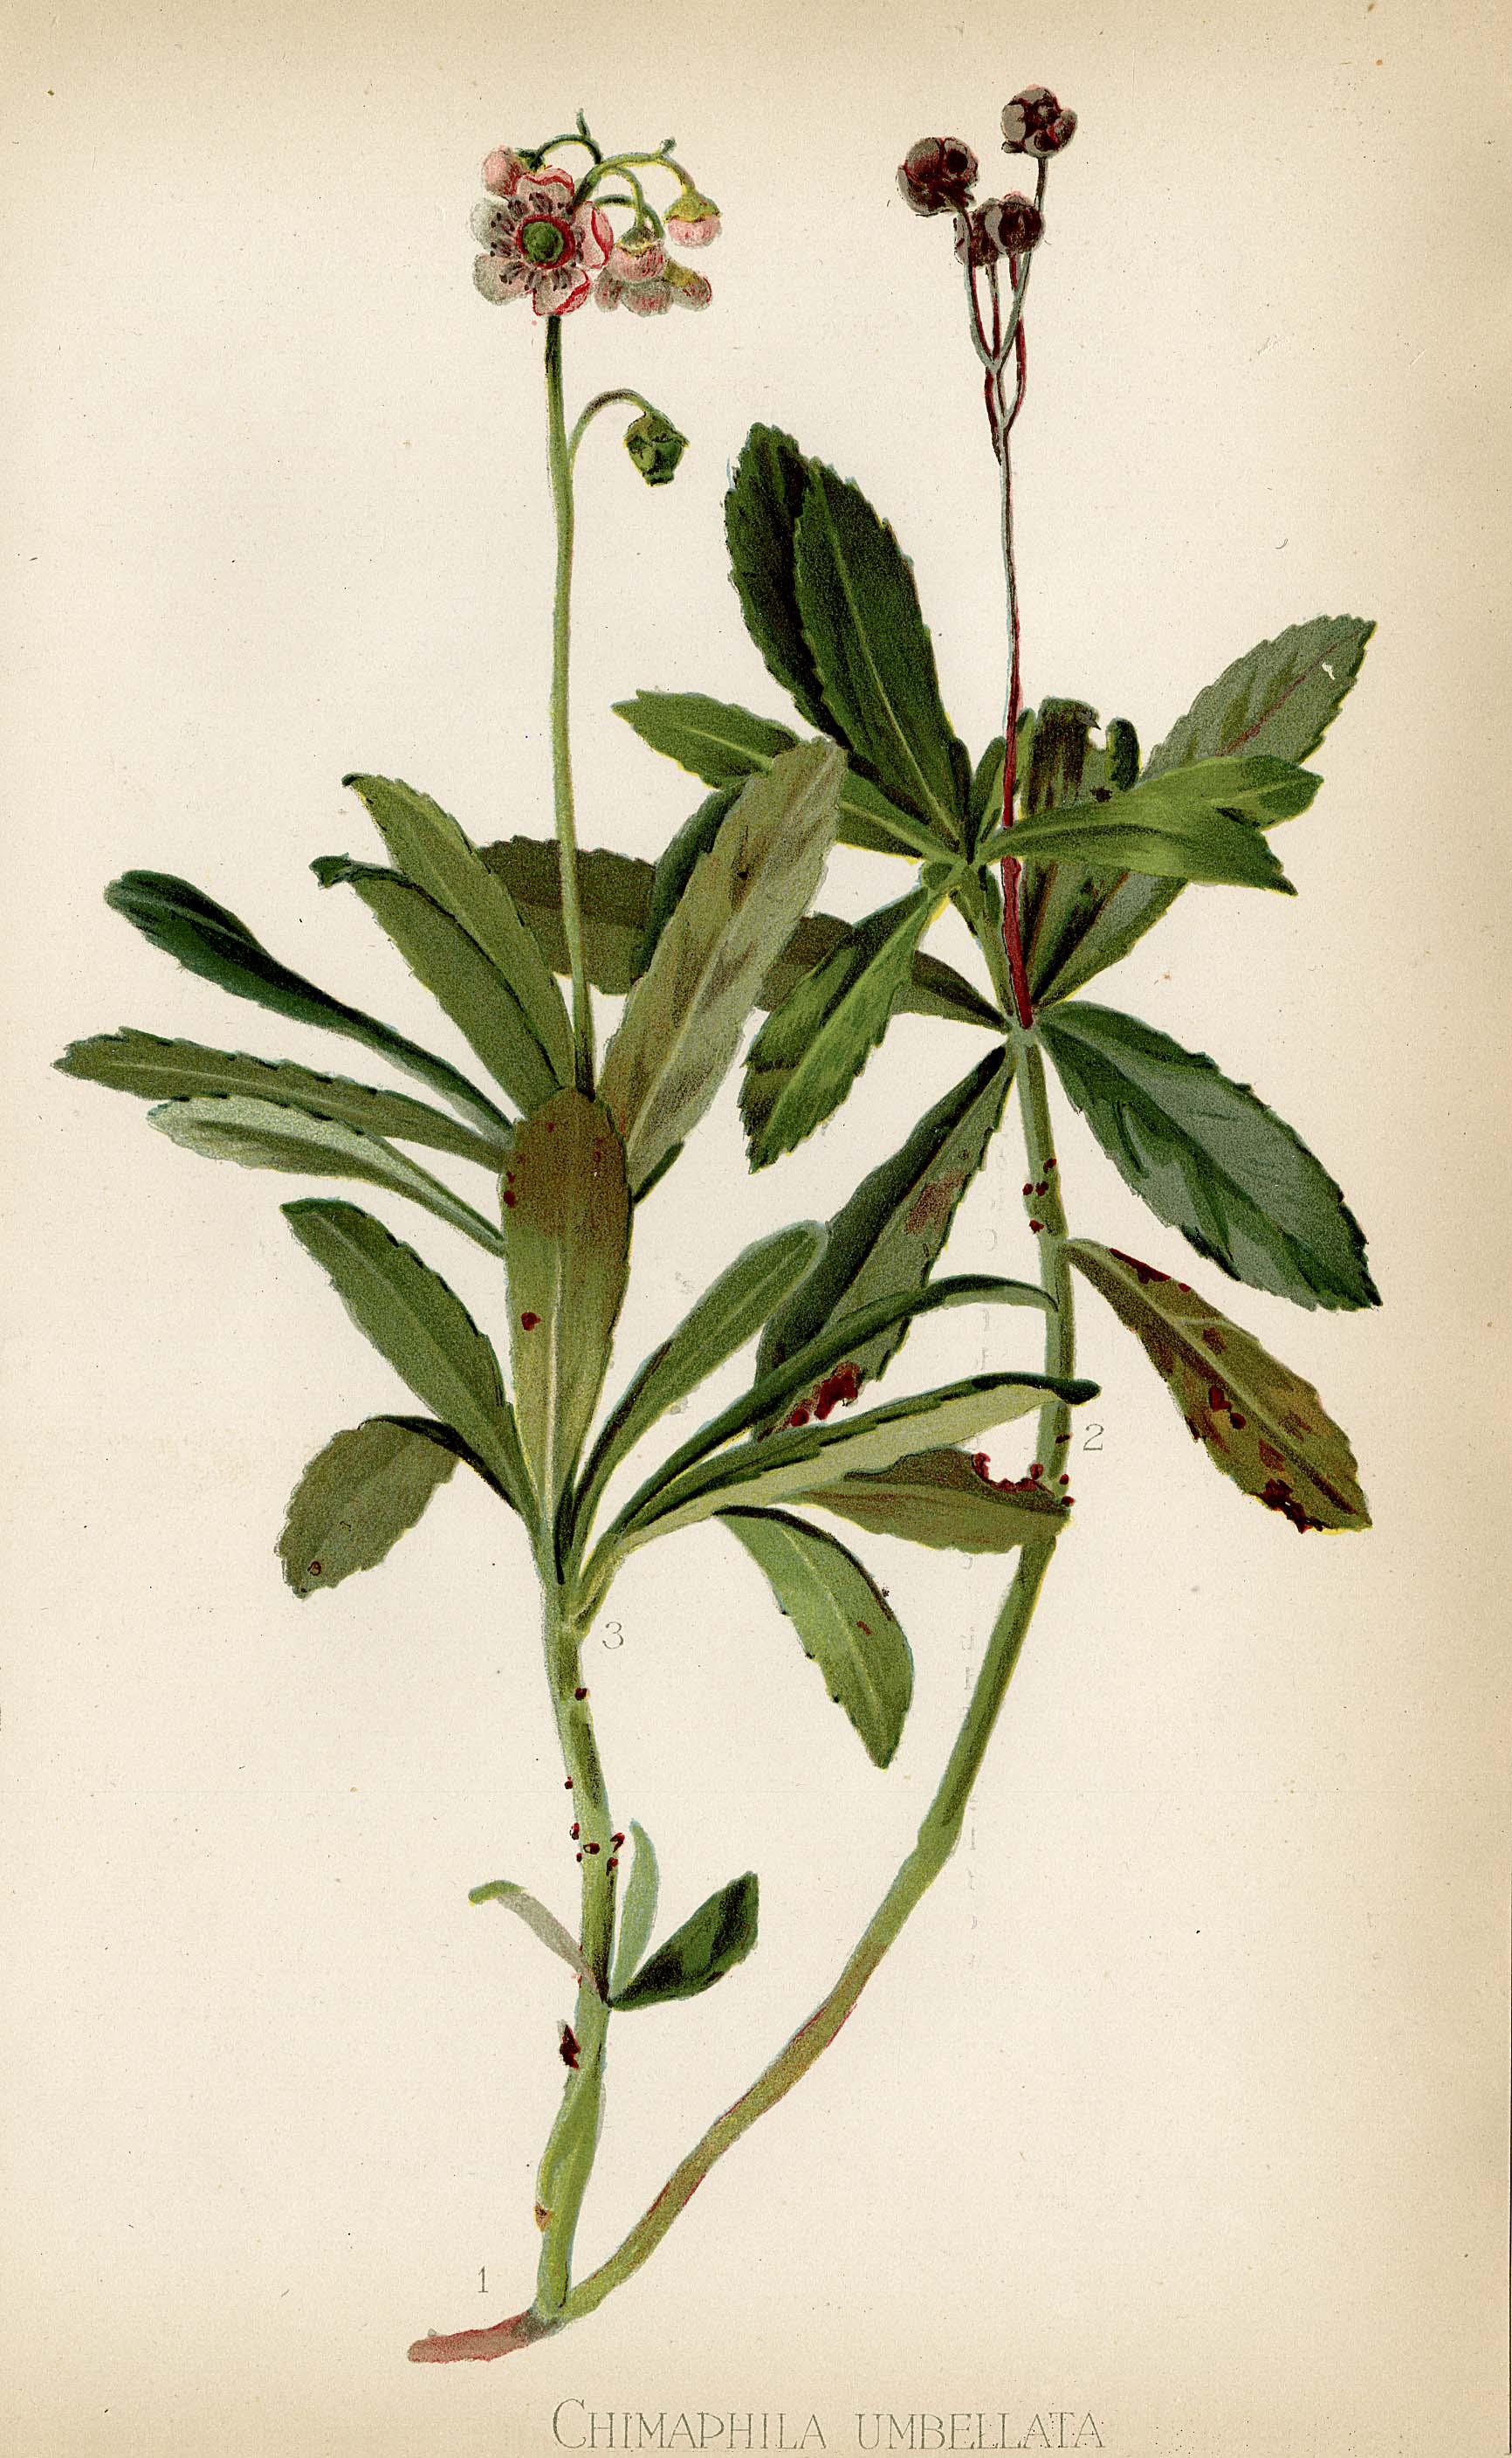 Chimaphila